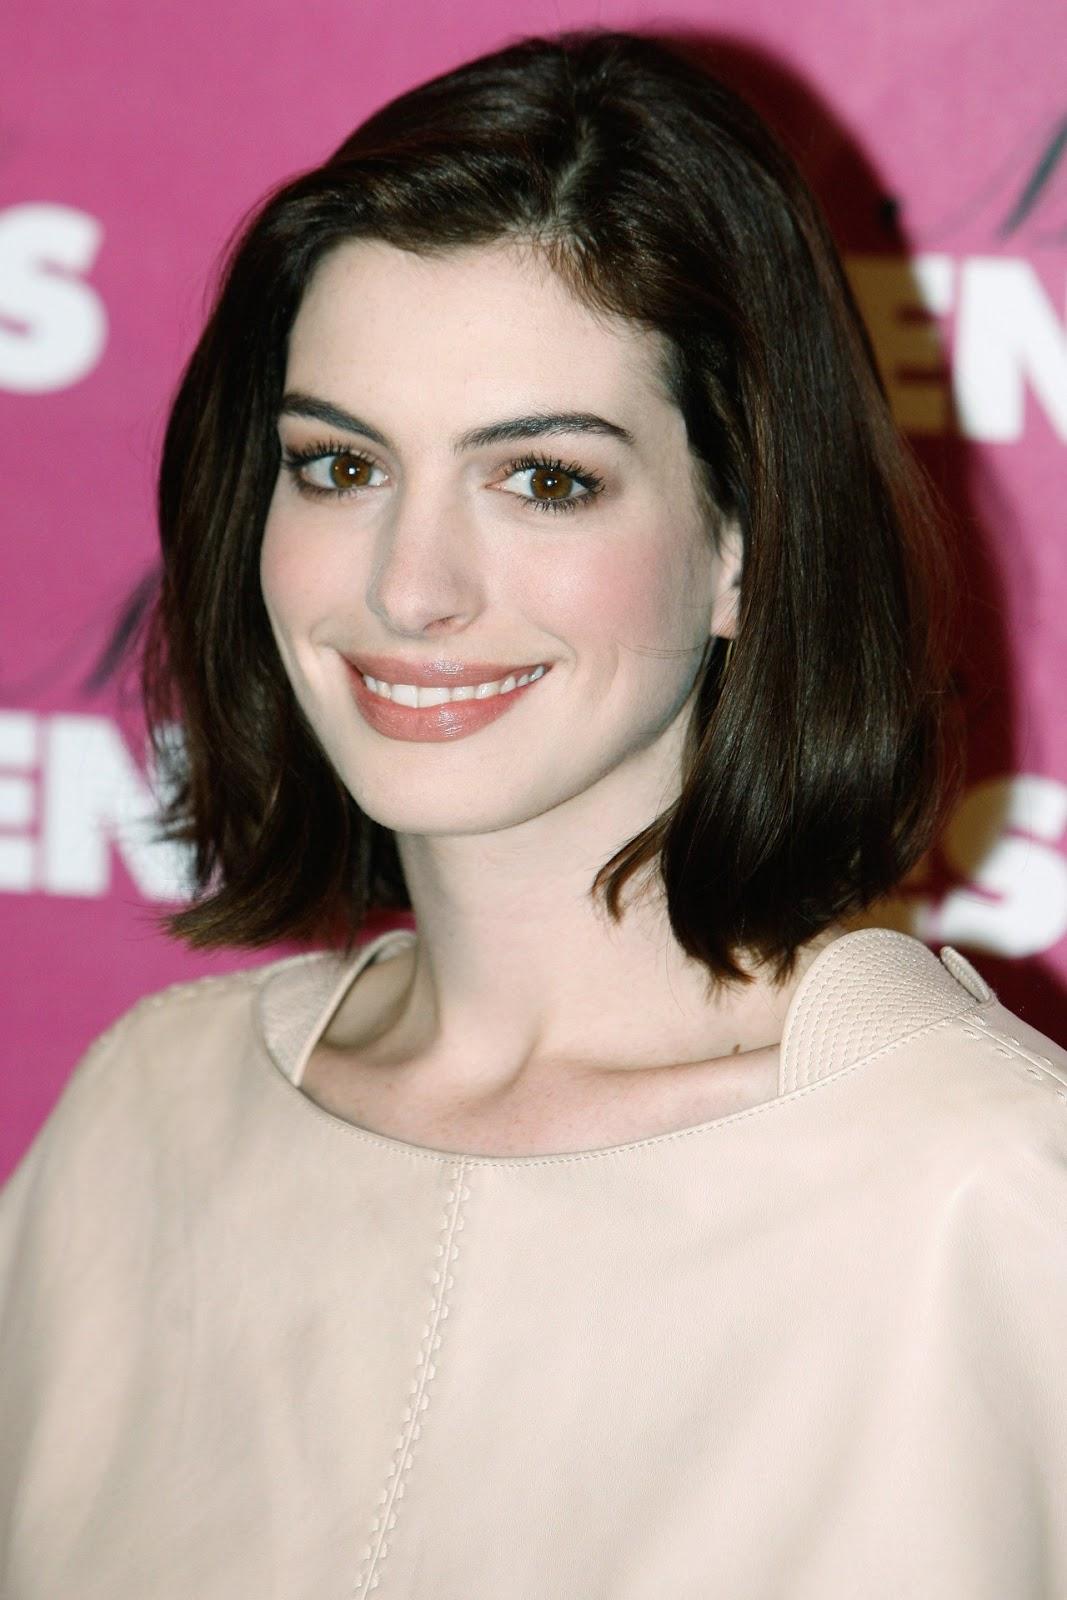 Anne Hathaway Smiling Face Wallpaper, HD Celebrities 4K